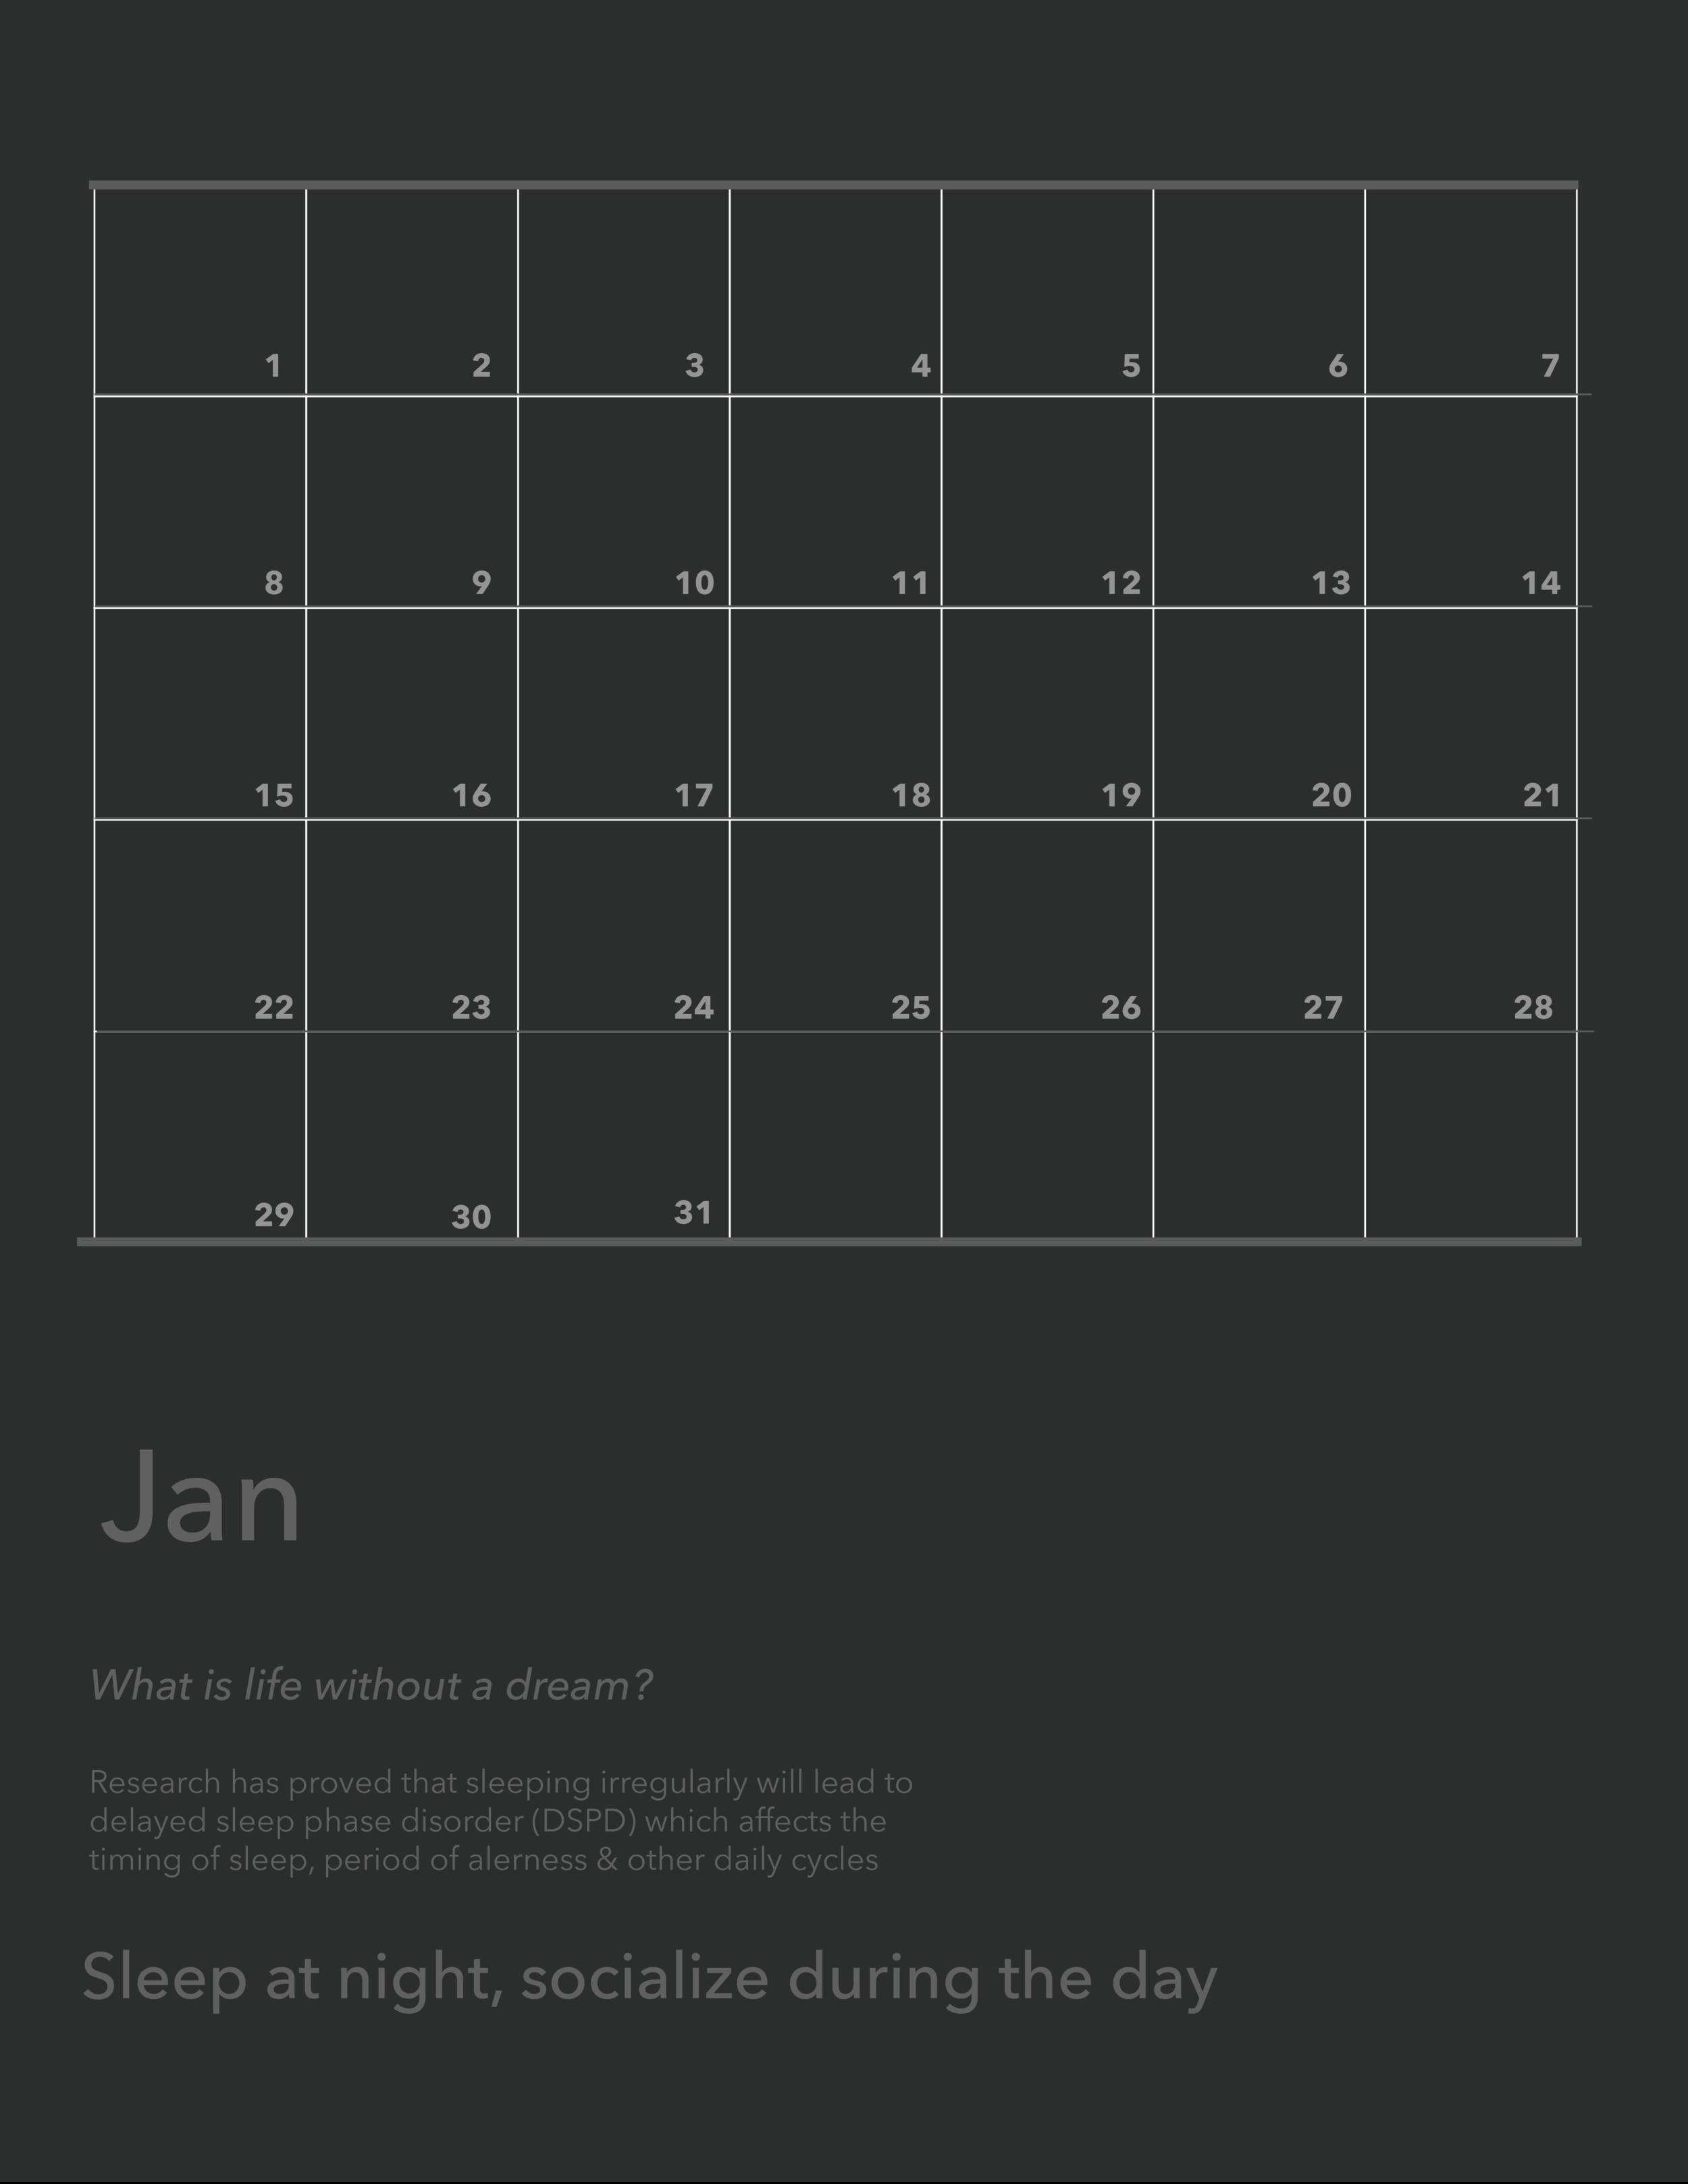 CalendarPoster_nostickers-18.png